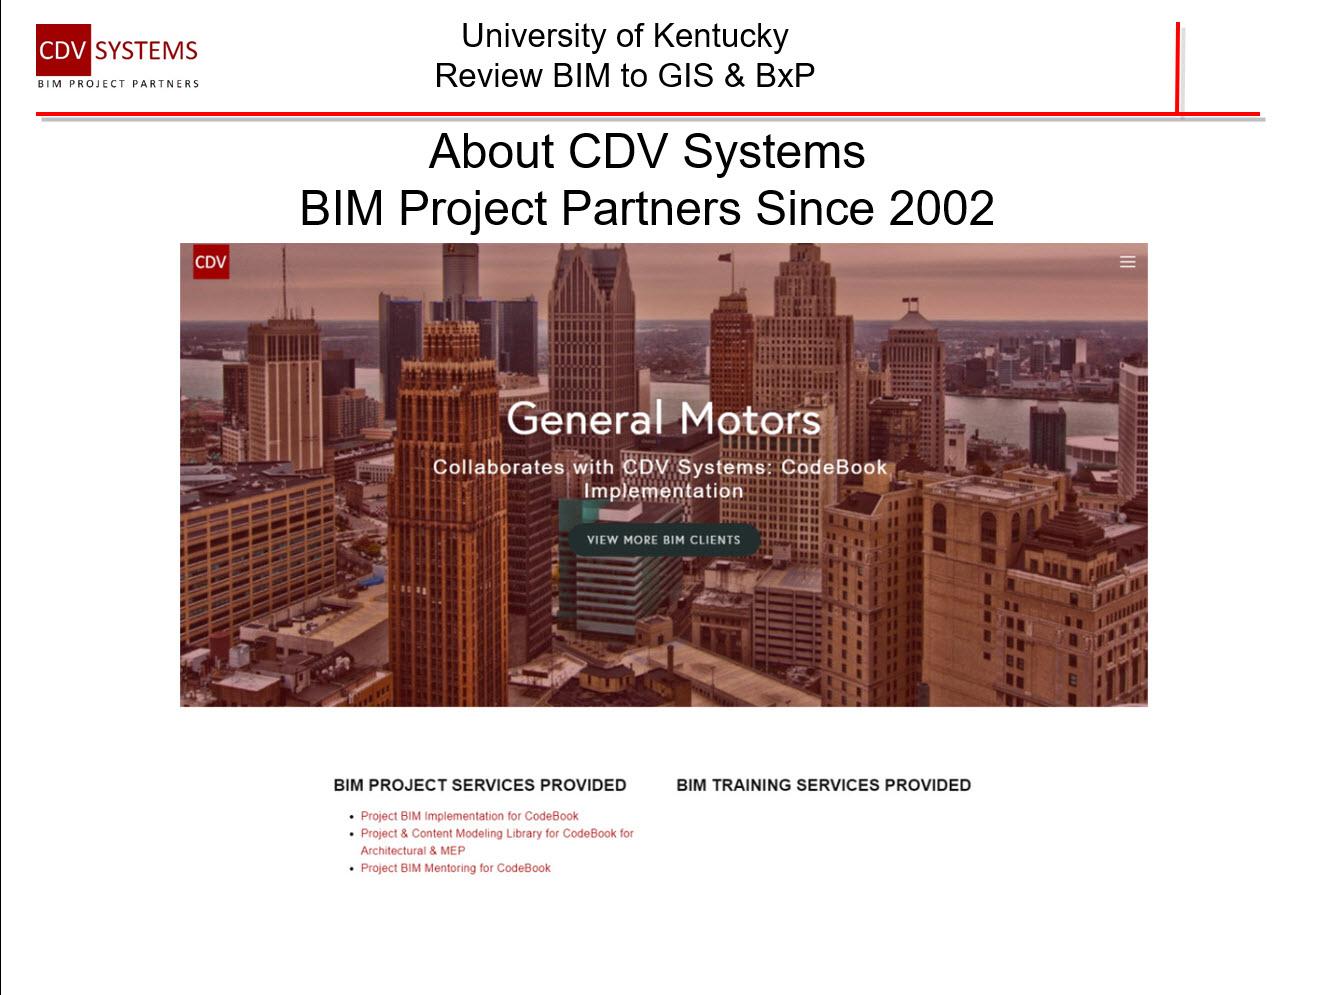 University of Kentucky_001h.jpg